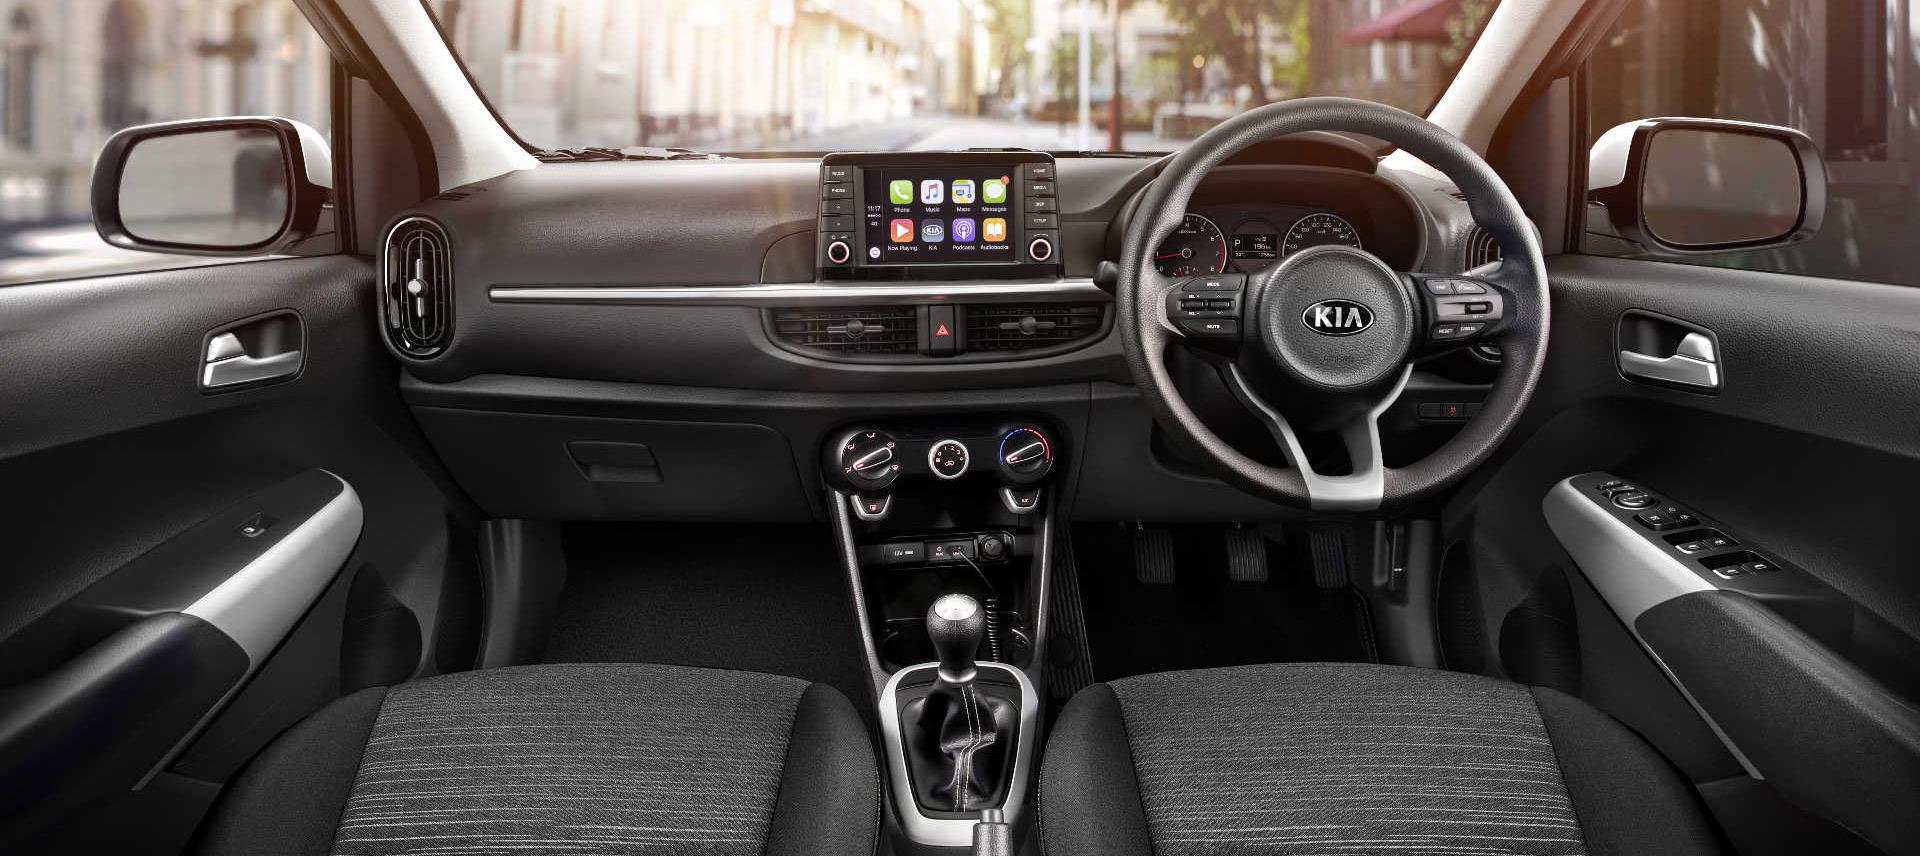 Kia Picanto Image 2